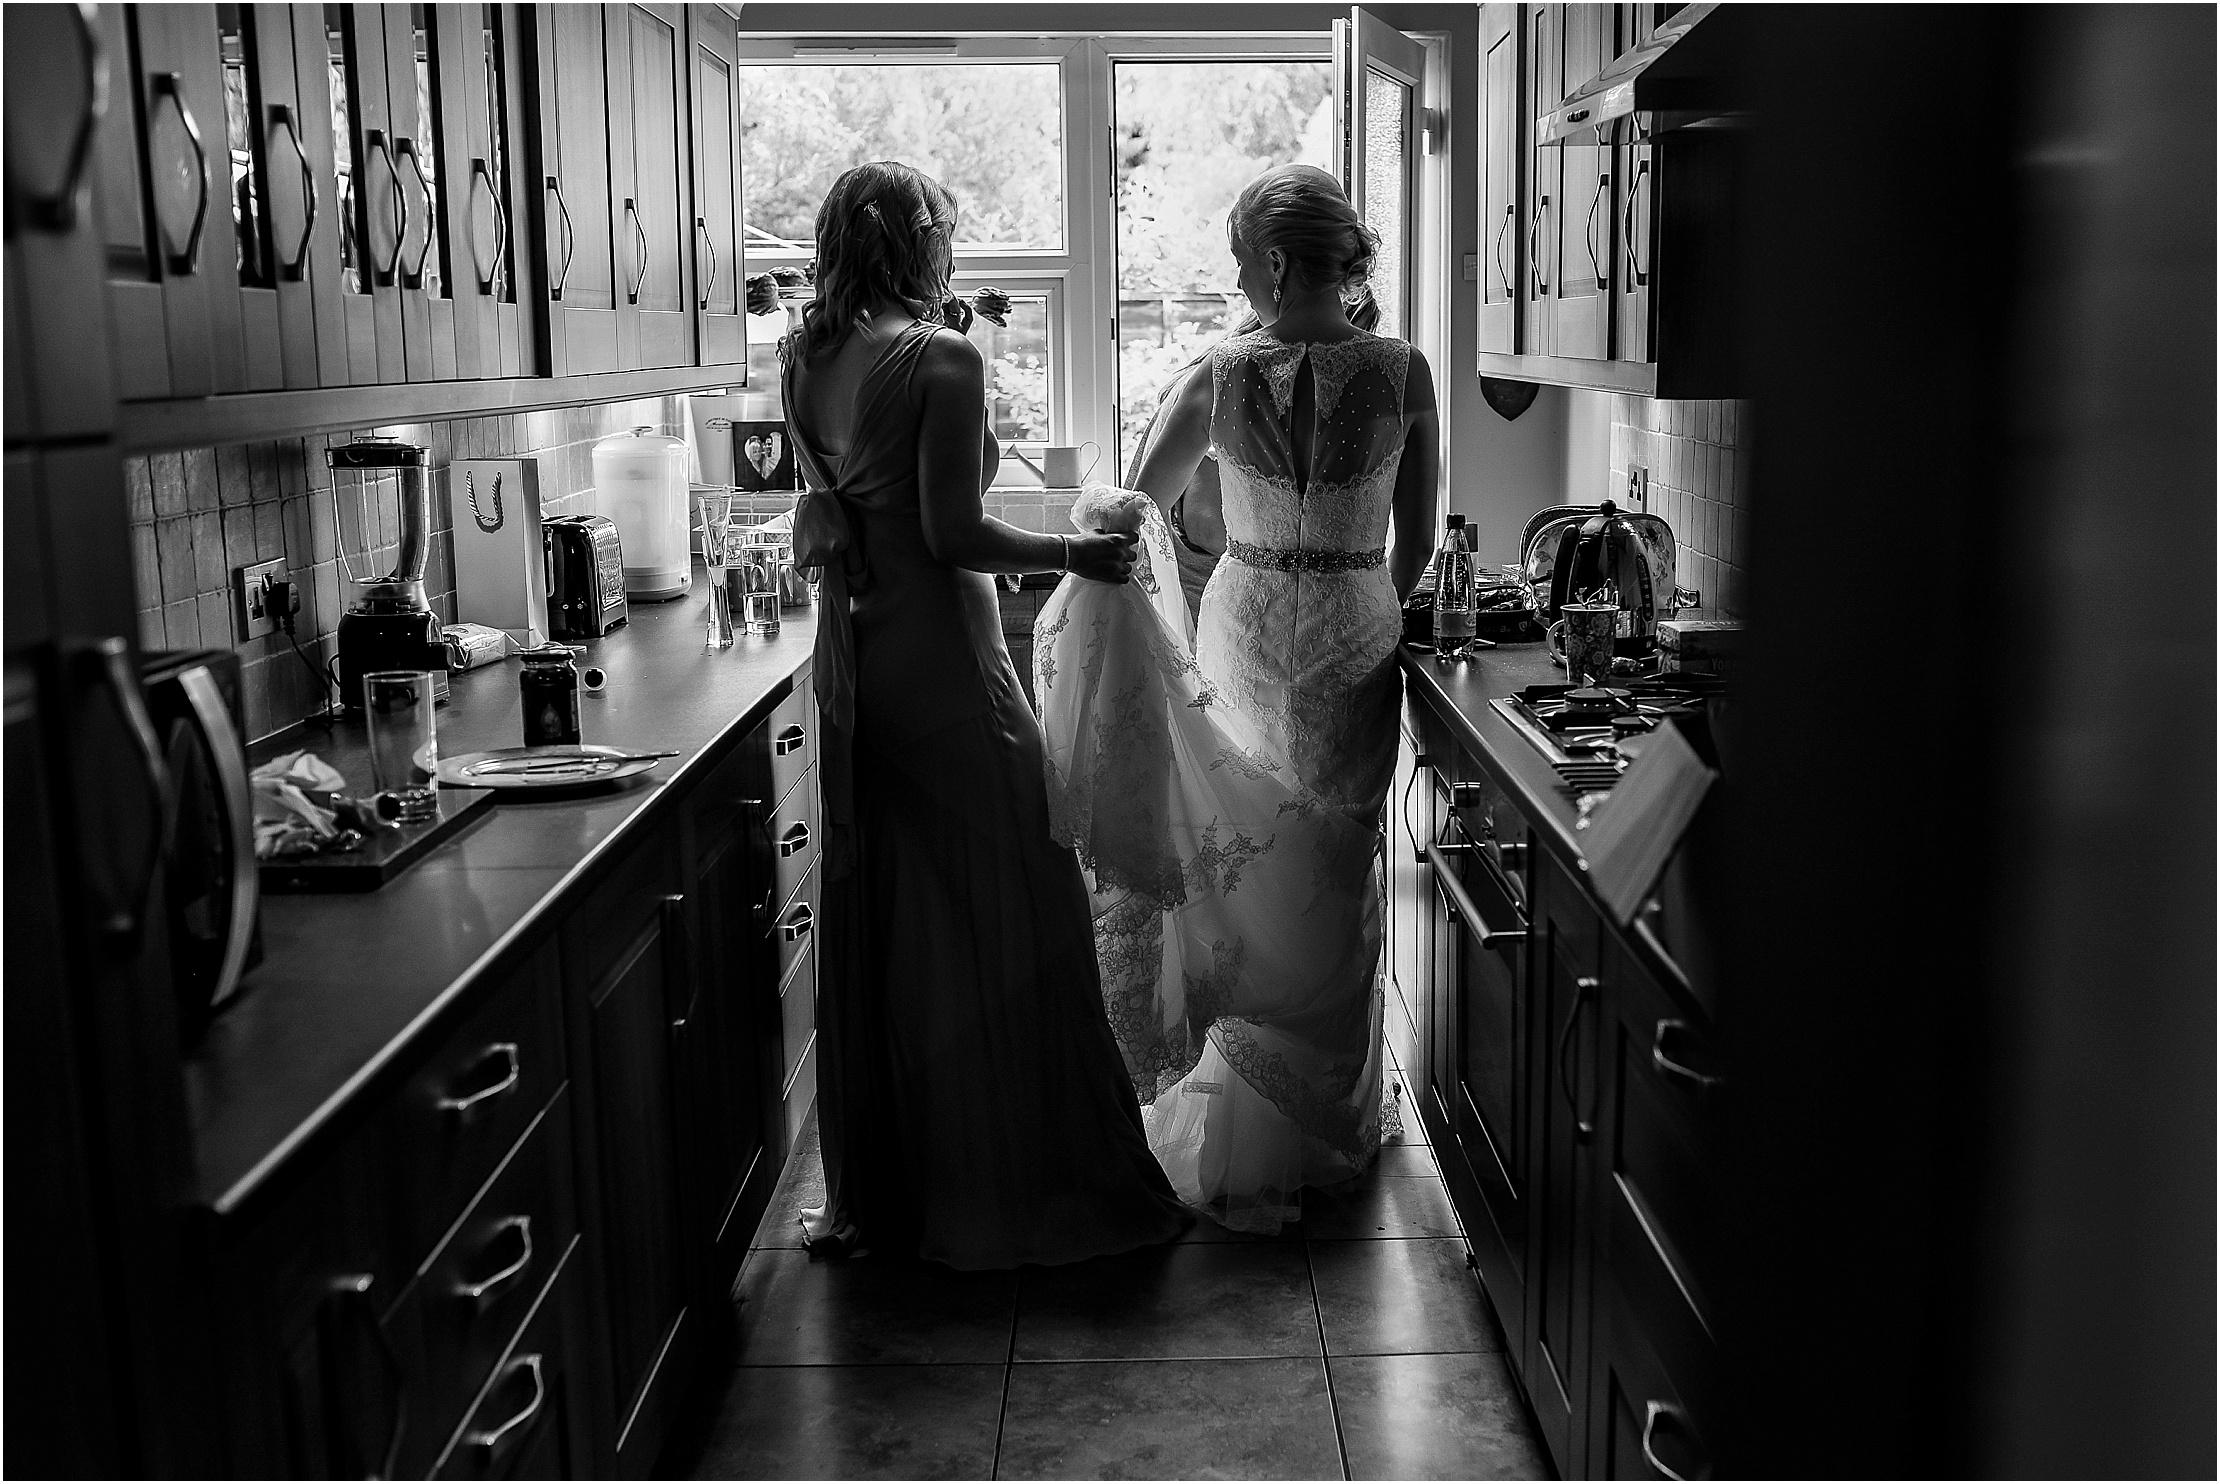 staining-lodge-wedding-038.jpg